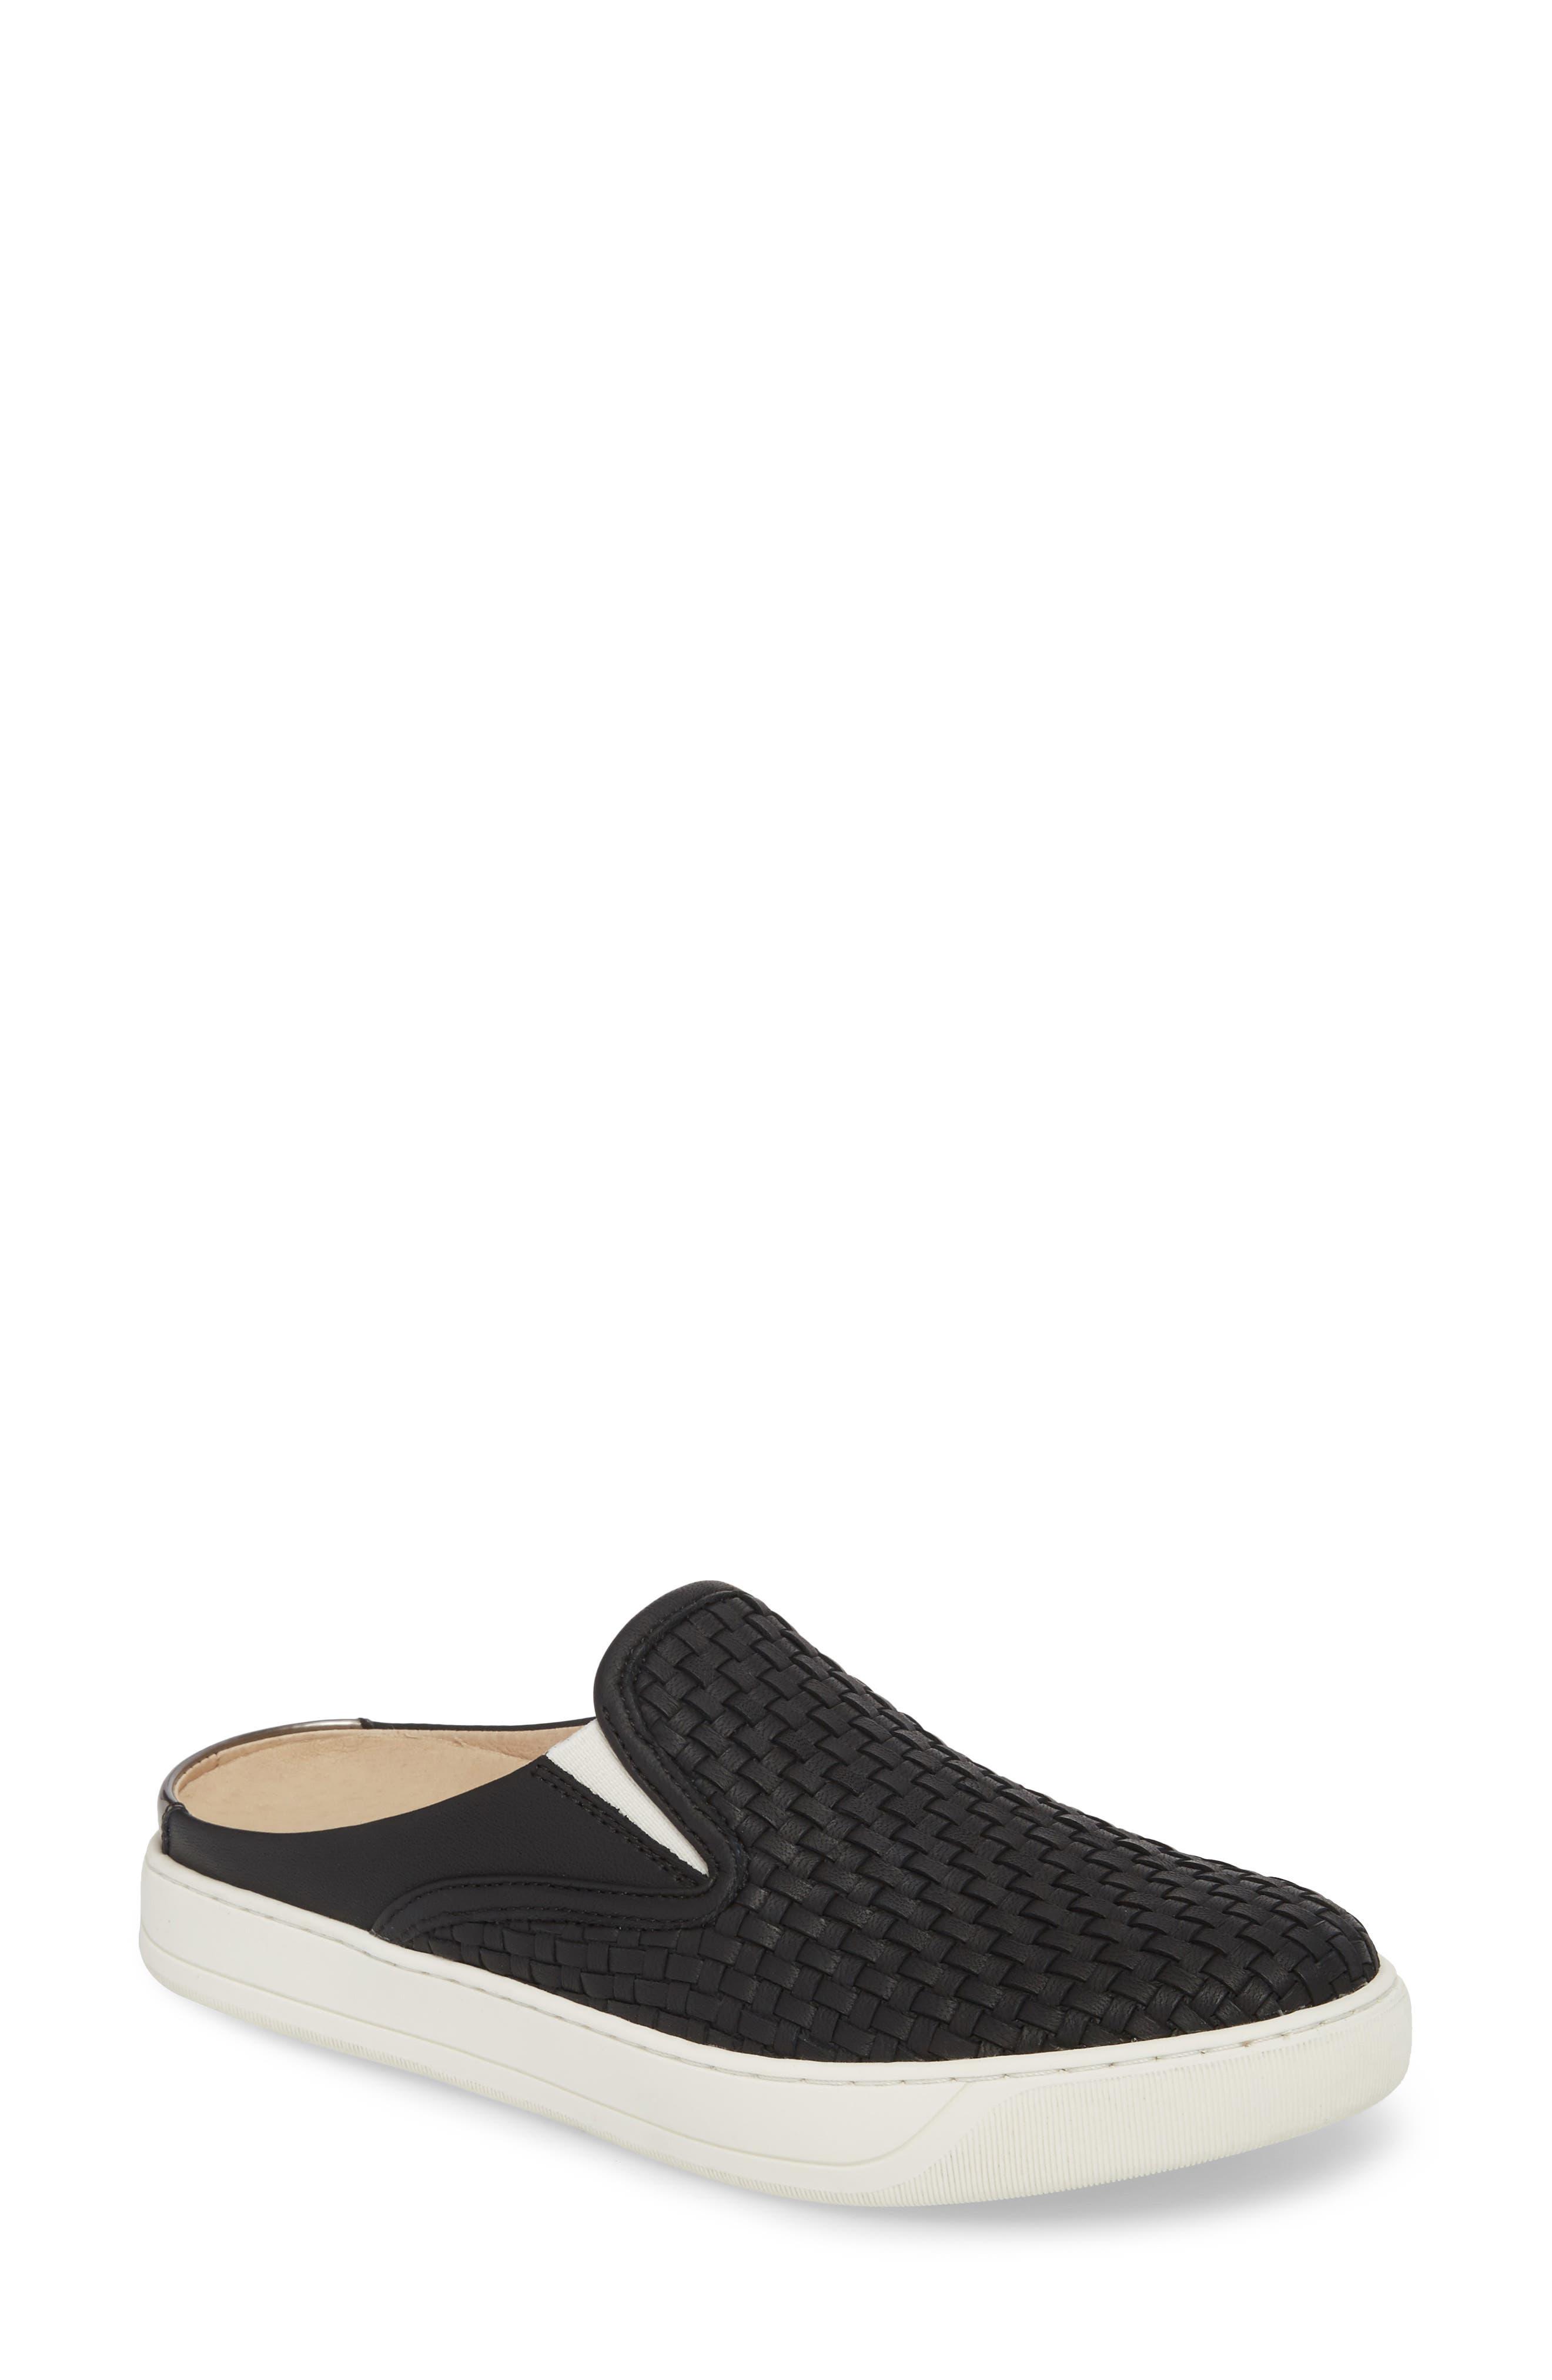 JOHNSTON & MURPHY, Evie Slip-On Sneaker, Main thumbnail 1, color, BLACK LEATHER